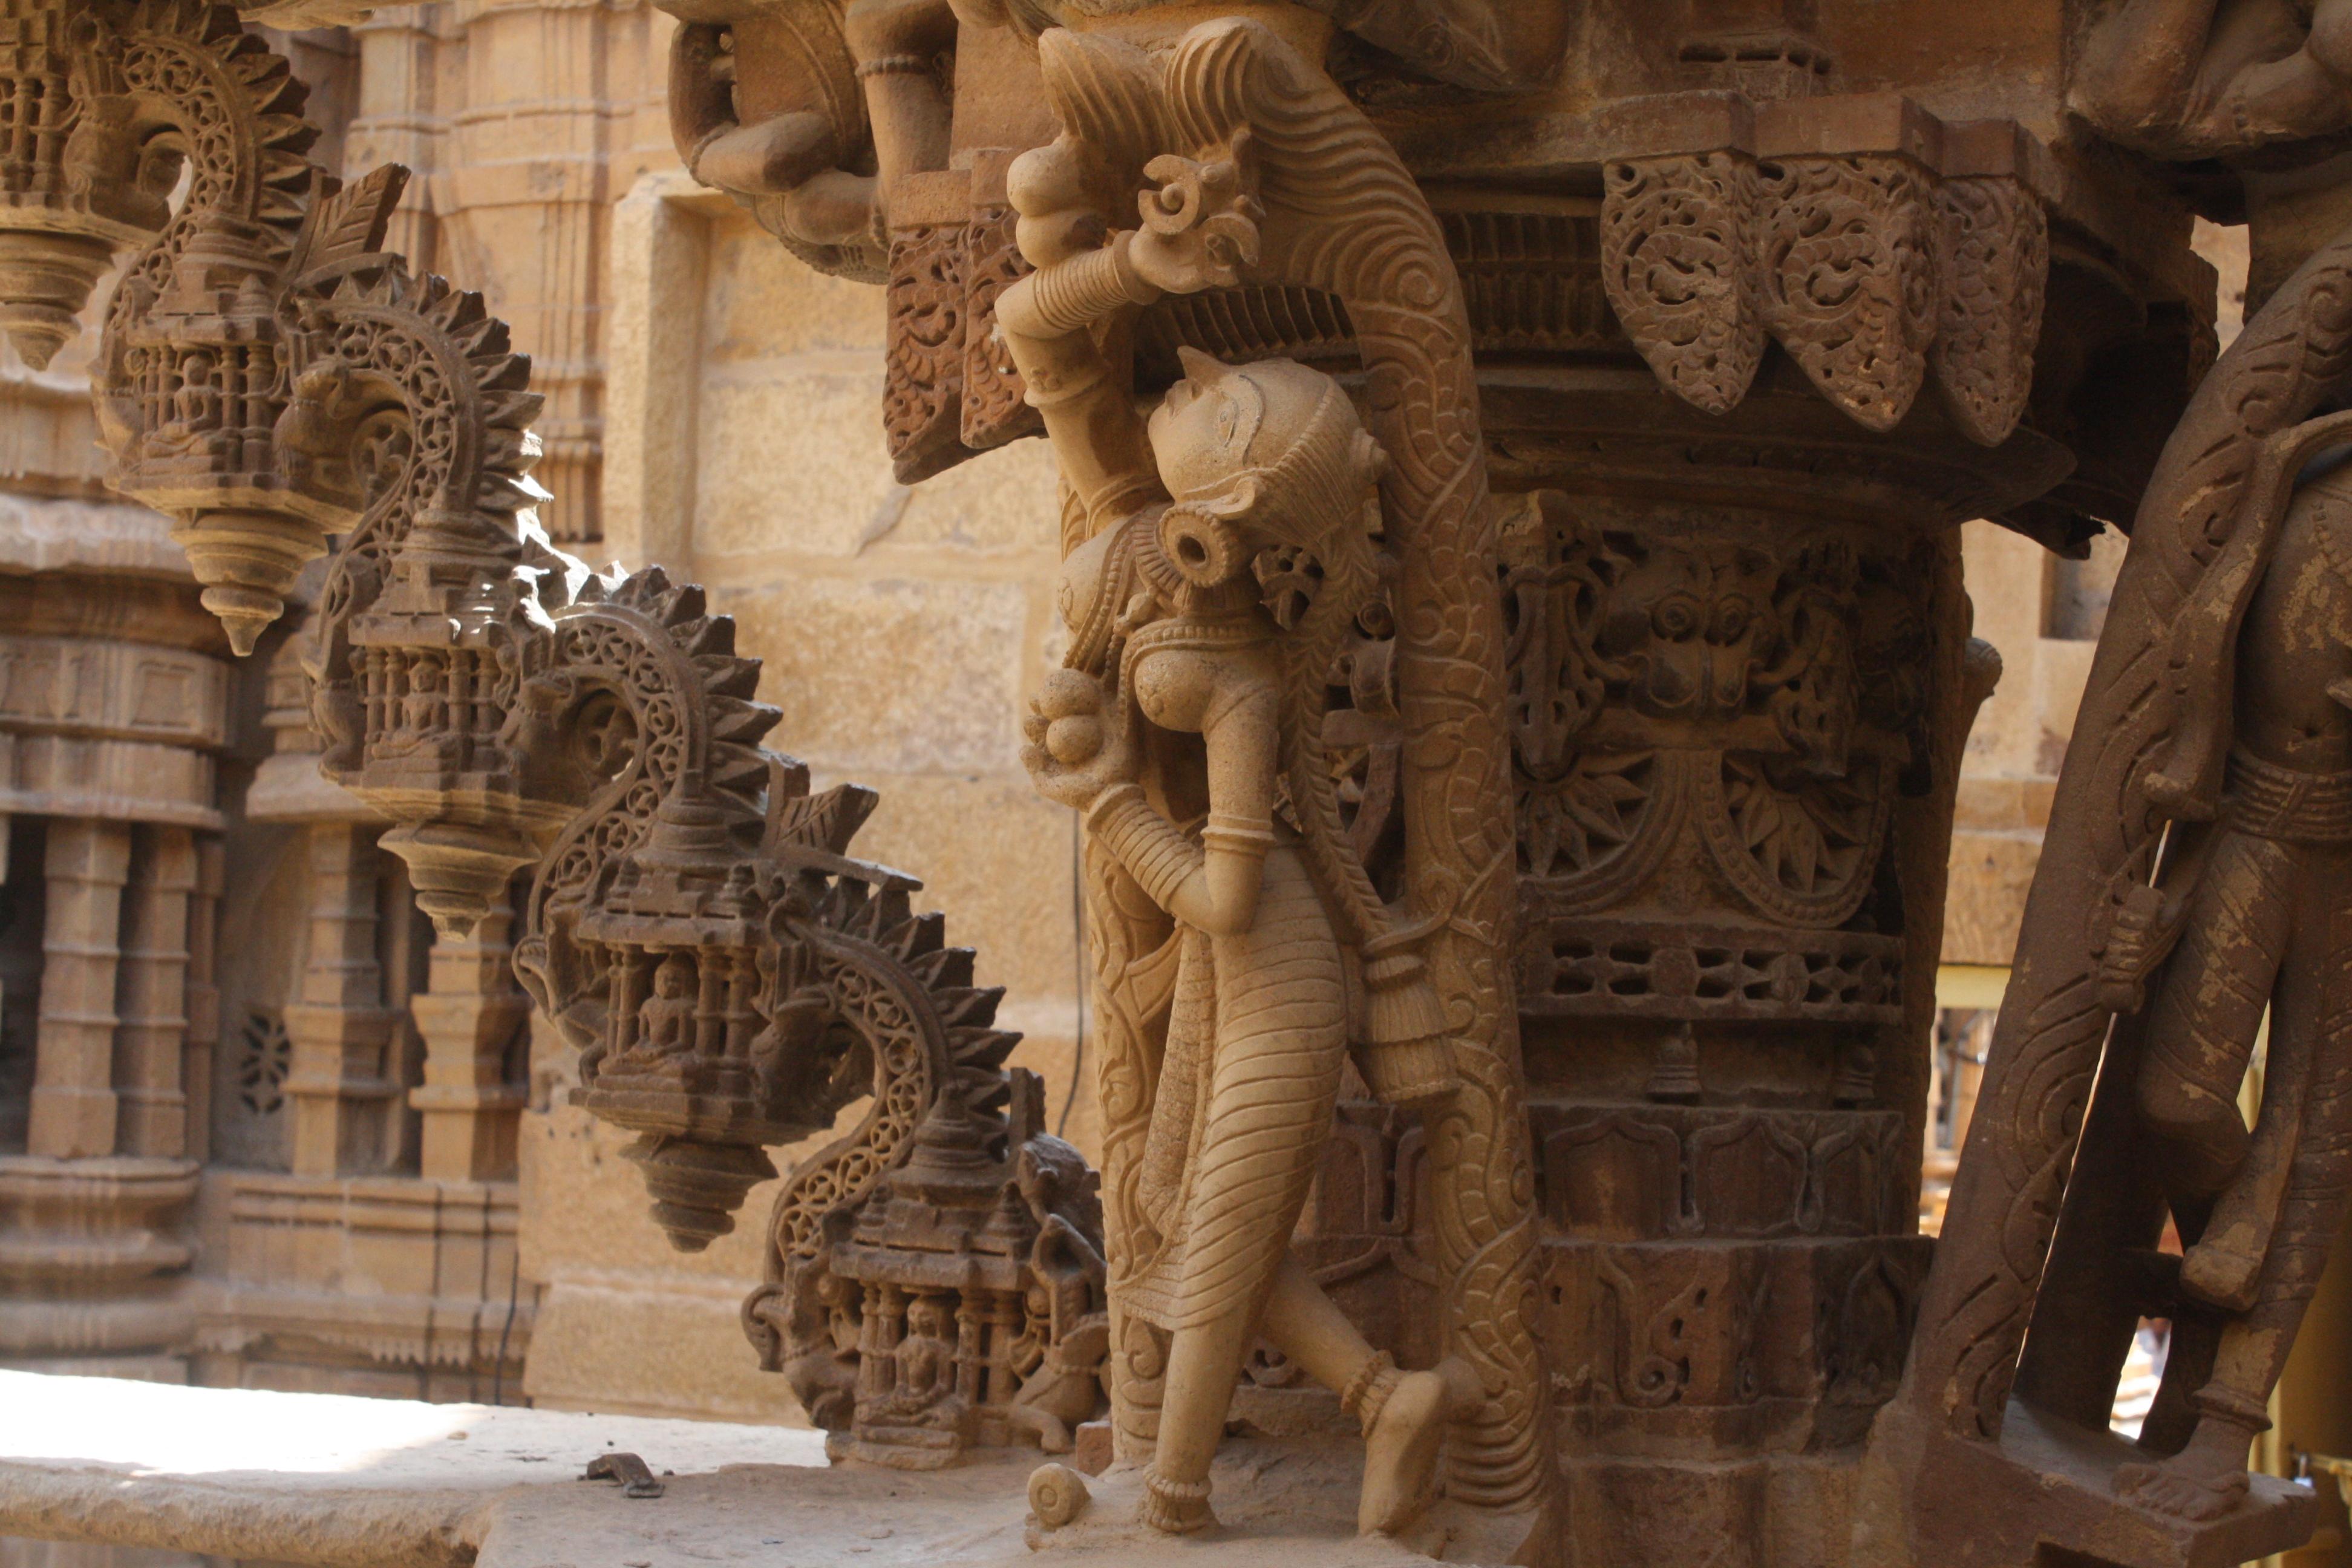 national geographic ancient india with File Ancient Jain Temple Inside Jaisalmer Fort on Haiti also 4 in addition File Ancient Jain temple inside Jaisalmer fort furthermore Mayotte besides Photographer Profile Kyaw Kyaw Winn.